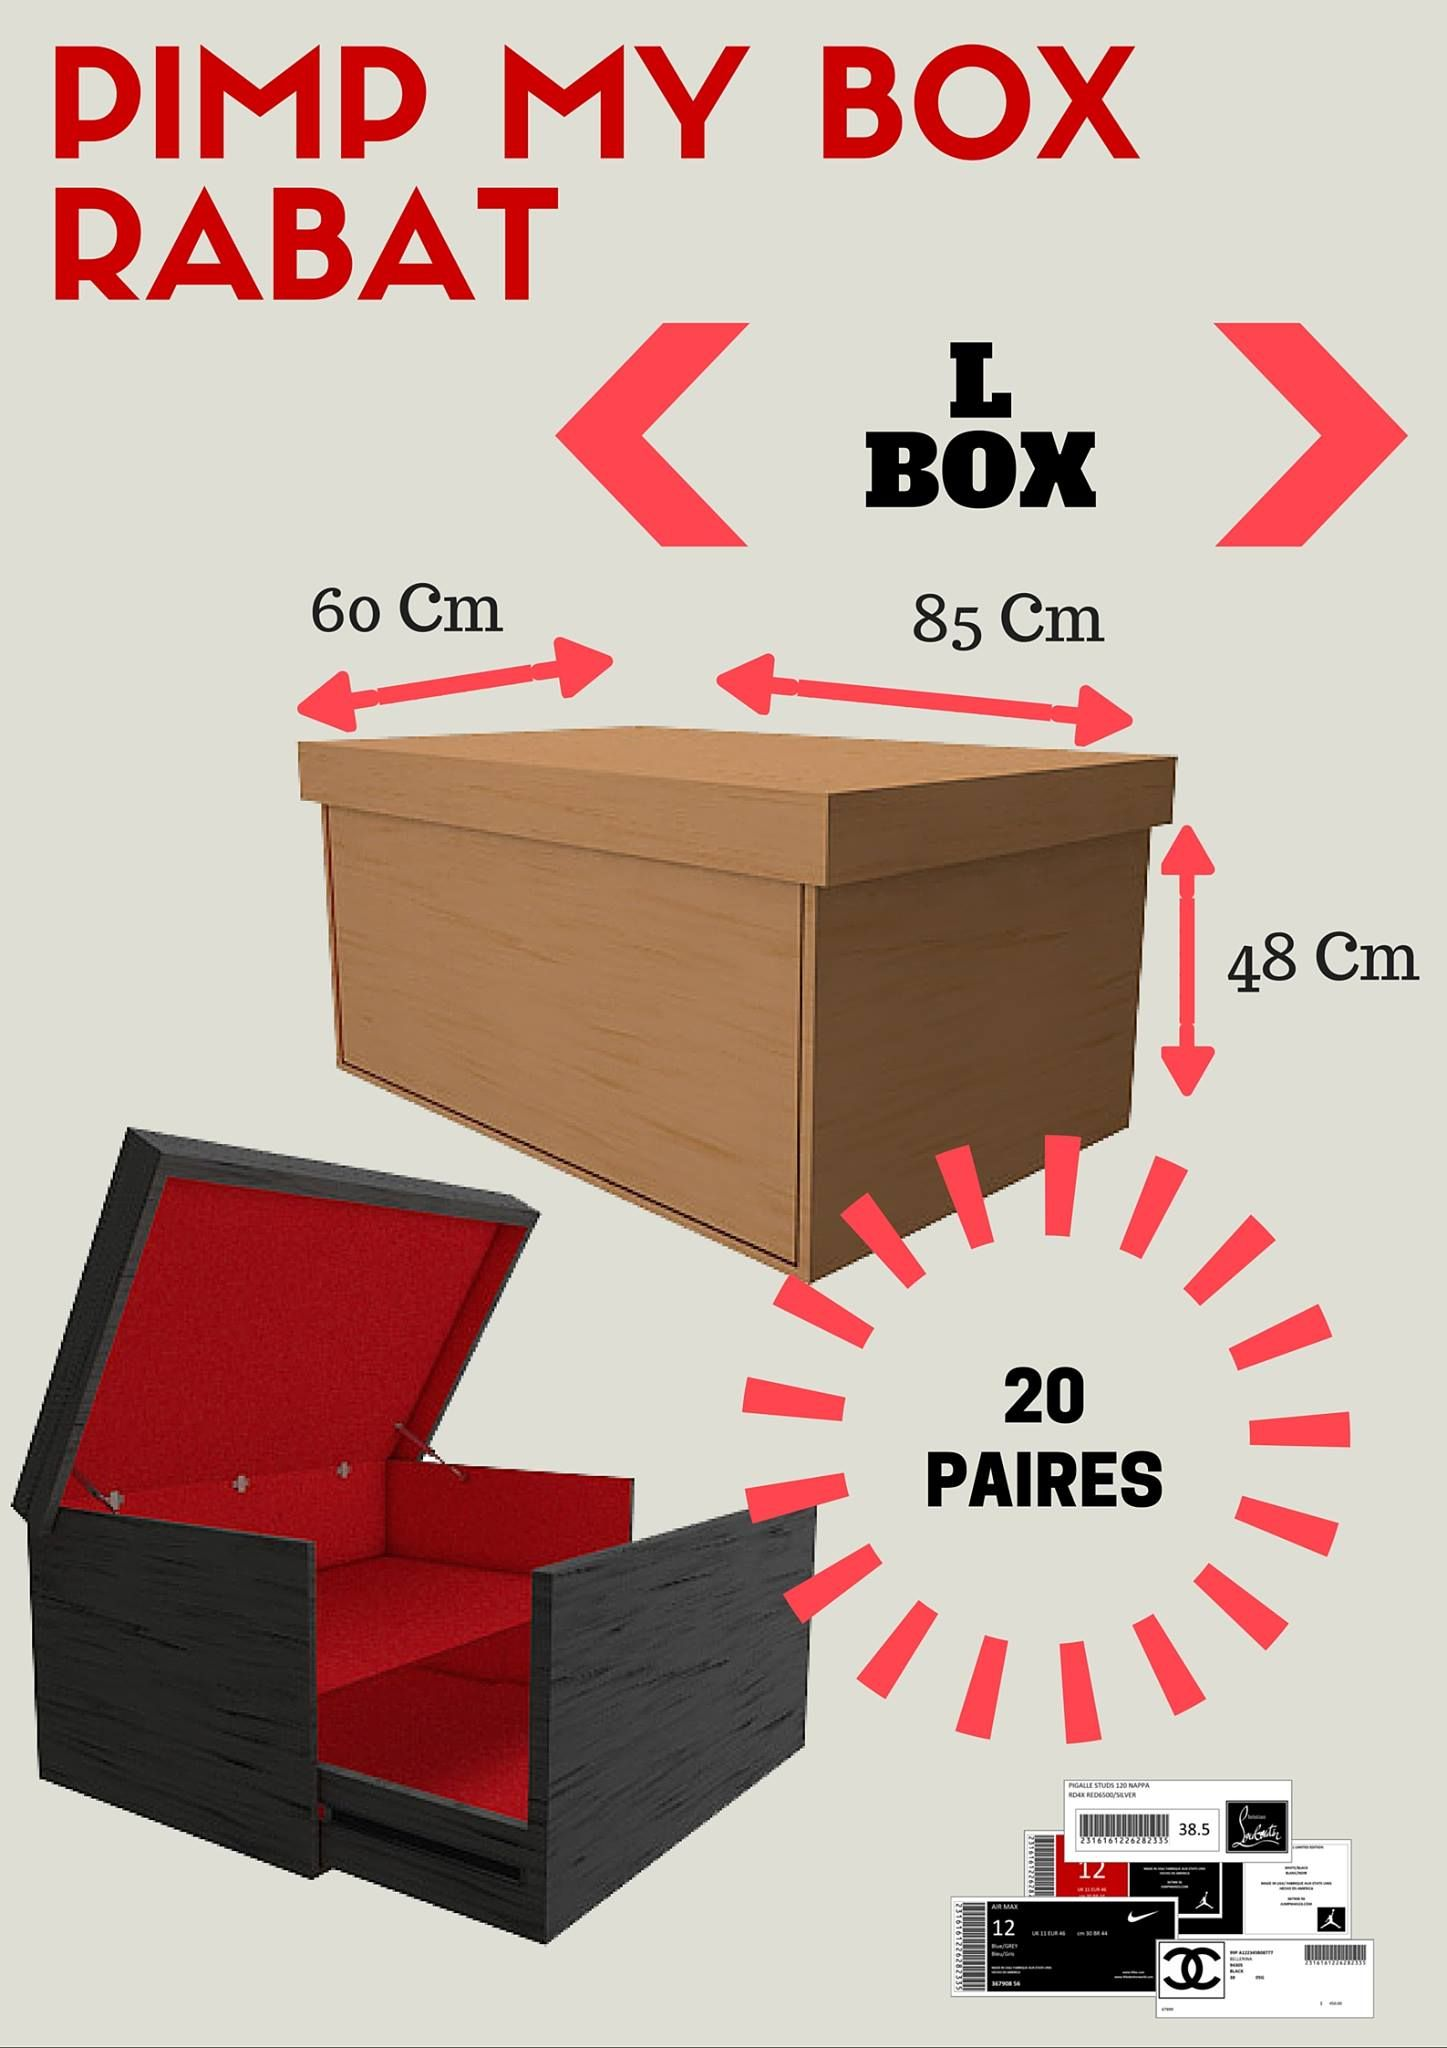 Giant Shoe Box More